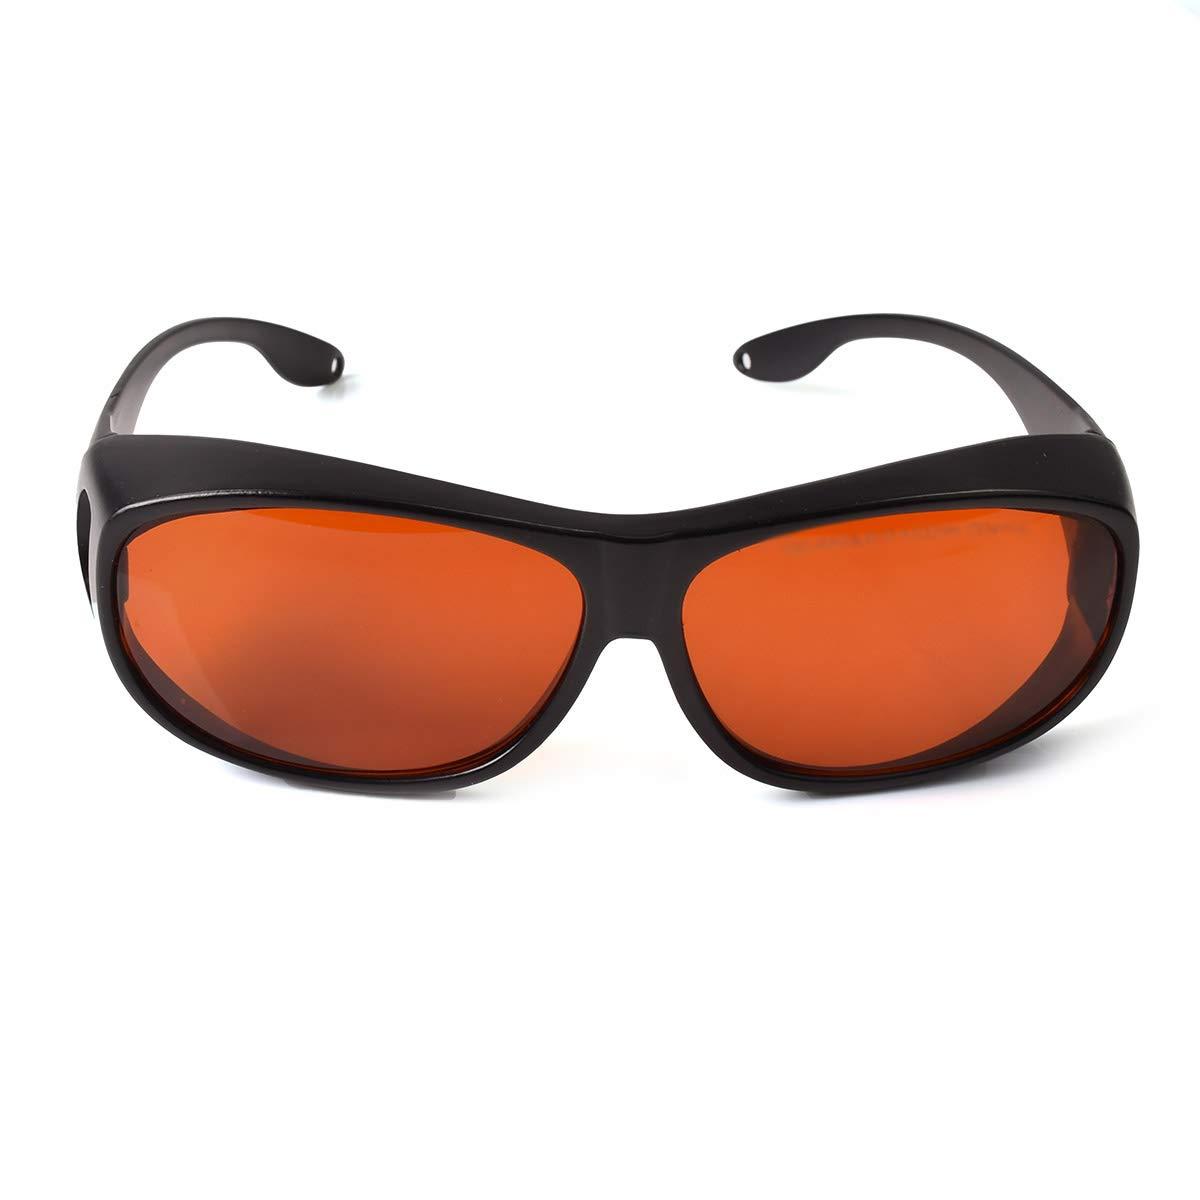 OD 6+ 190nm-550nm / 800nm-1100nm Wavelength Professional Laser Safety Glasses for 405nm, 450nm, 532nm, 808nm,980nm,1064nm, 1080nm, 1100nm Laser (Style 4) by FreeMascot